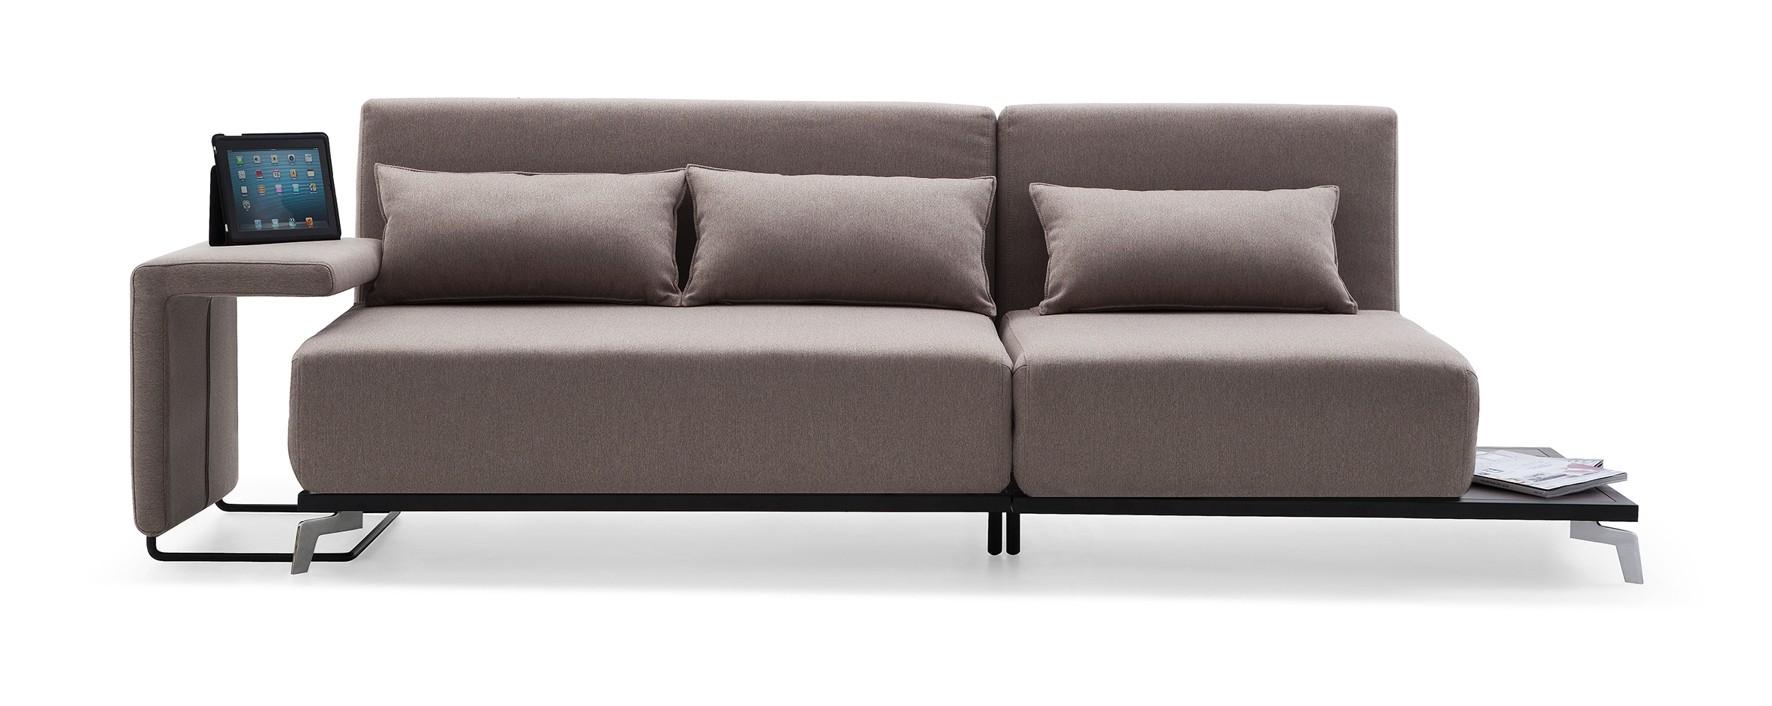 Modern sofa beds cado modern furniture - jh033 modern sofa bed ... OLLGKIA